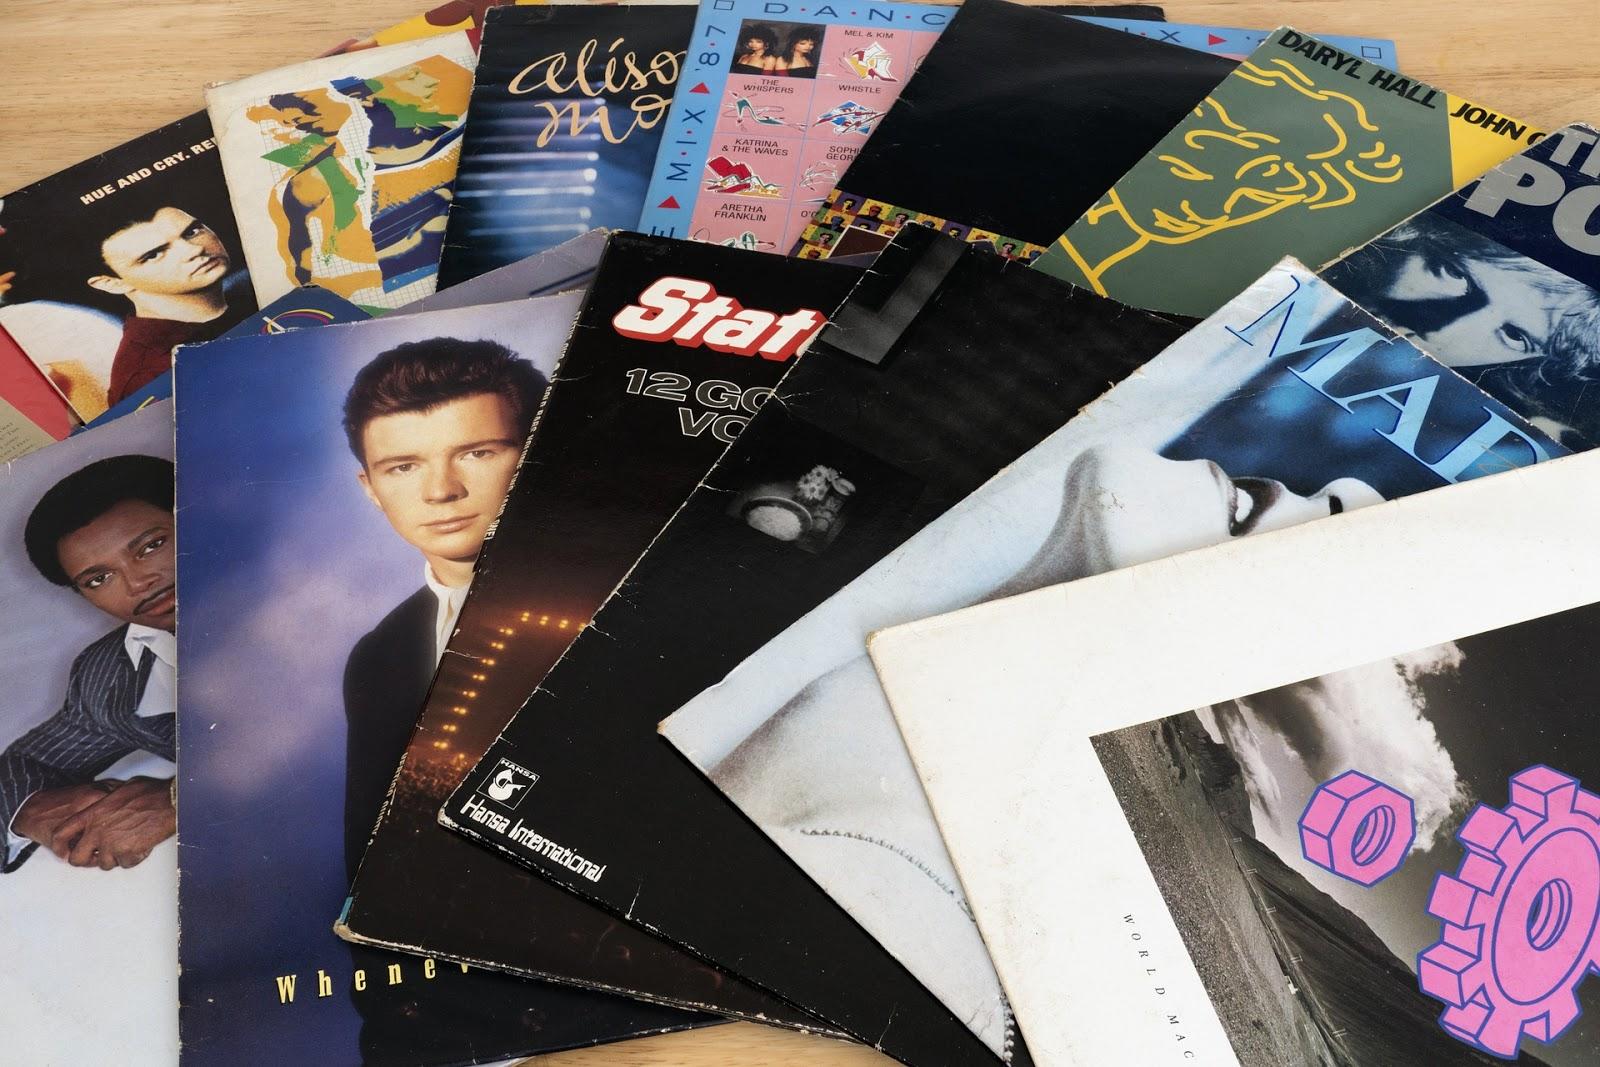 Why '80s Music Has Such a Unique Sound